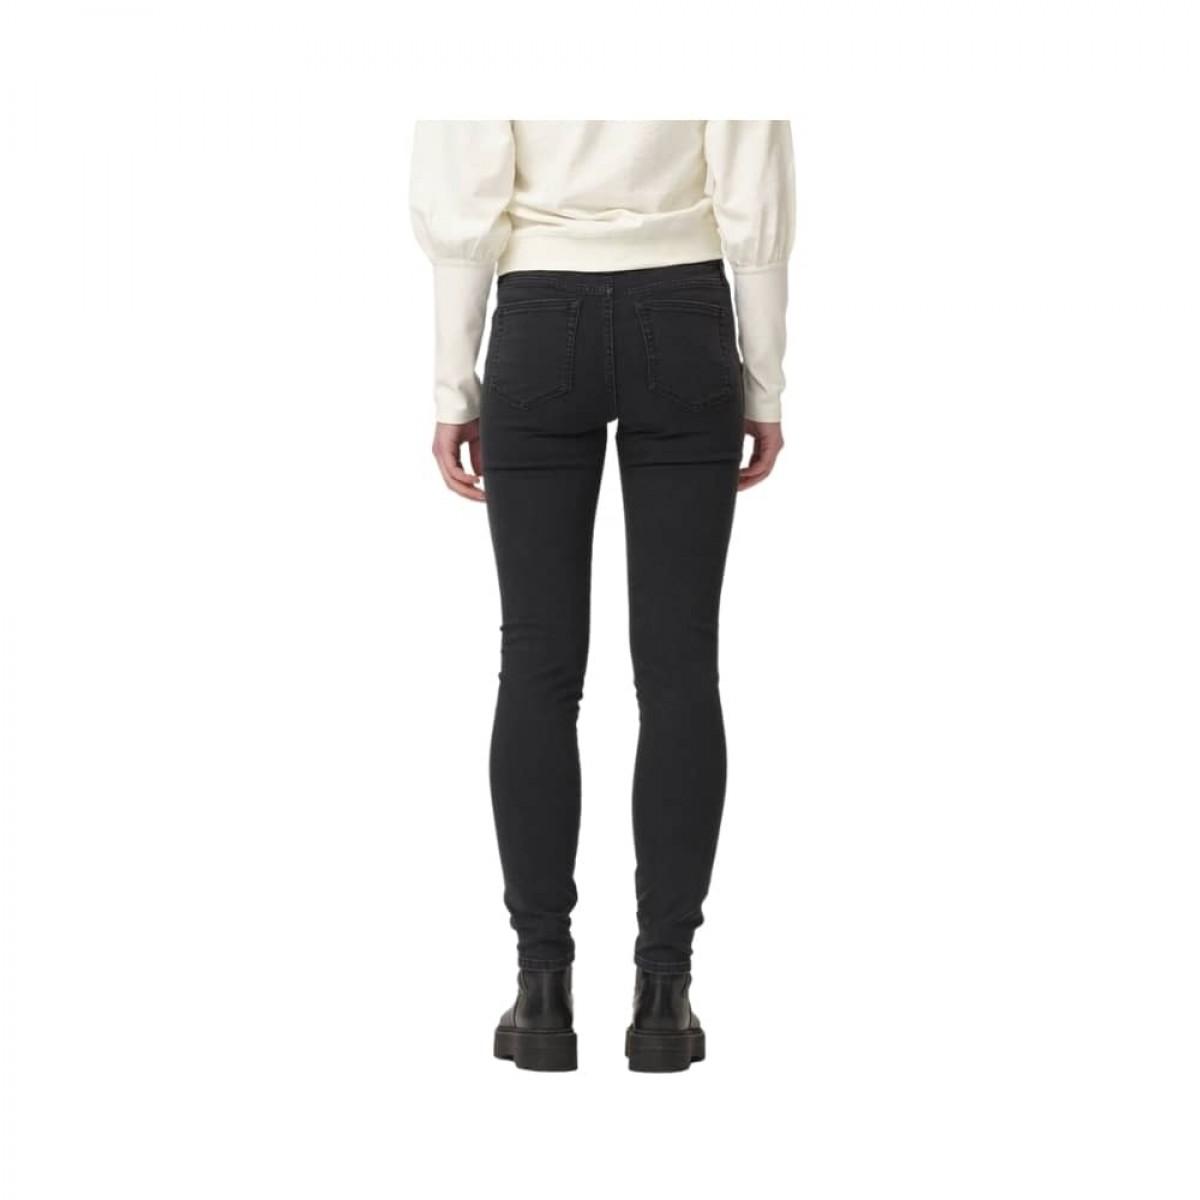 dylan slim jeans - black - model model bagfra